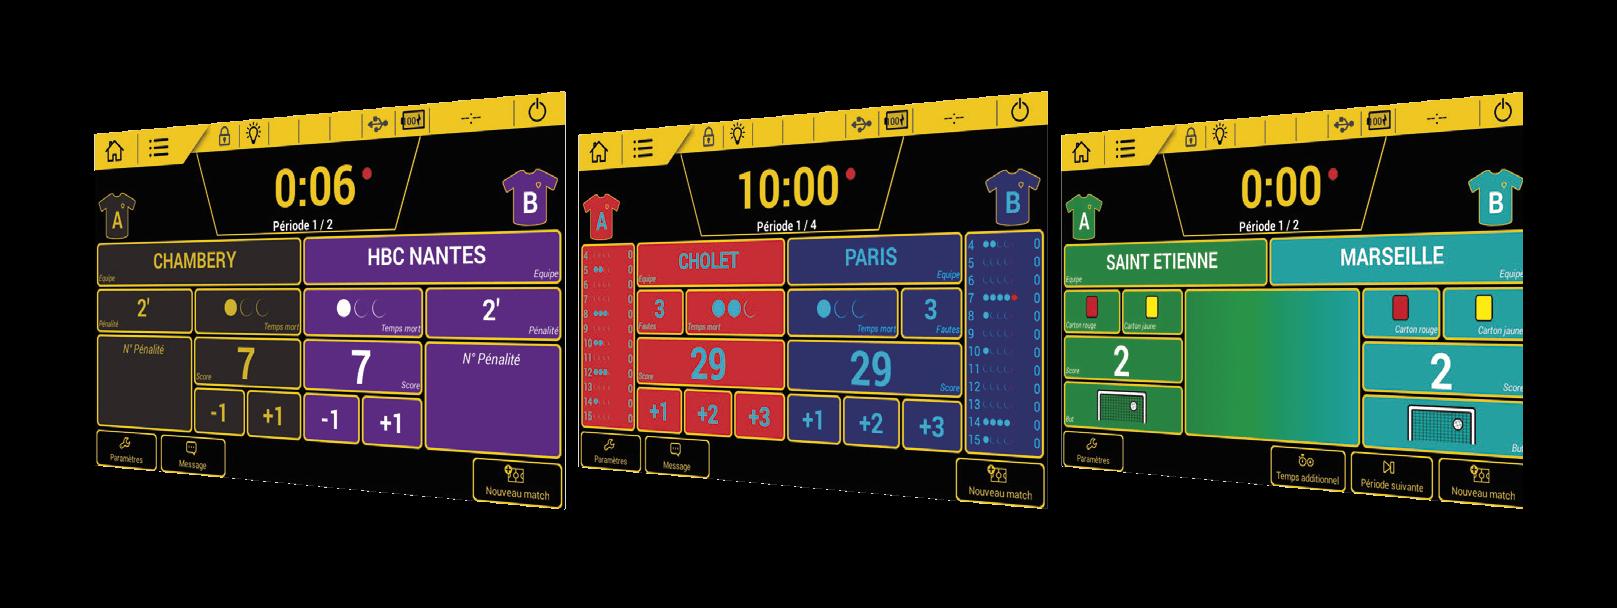 Scorepad - Ultra personnalisable